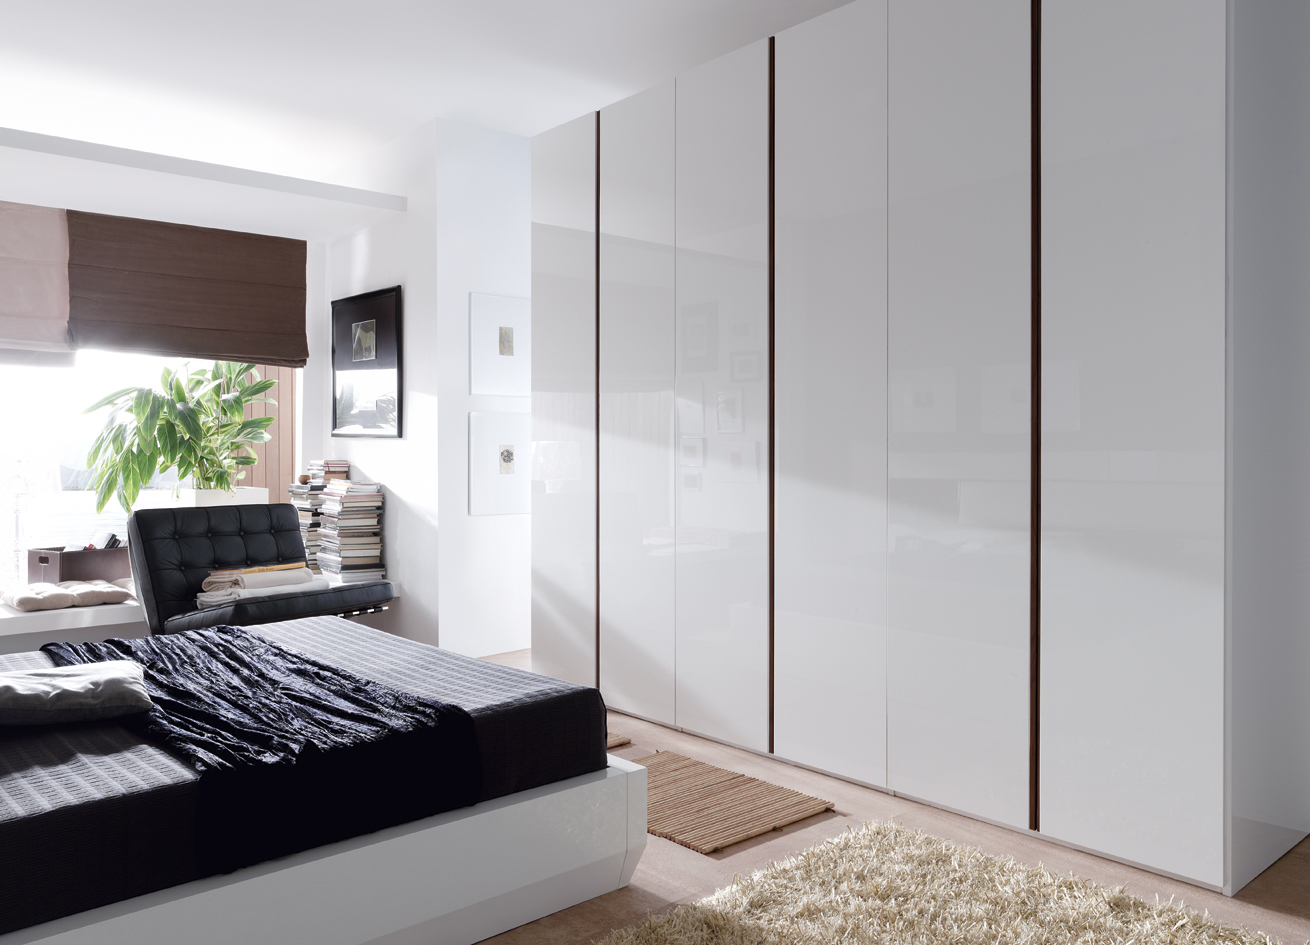 Imagenes armarios modernos nexo de piferrer built de - Fotos armarios empotrados modernos ...